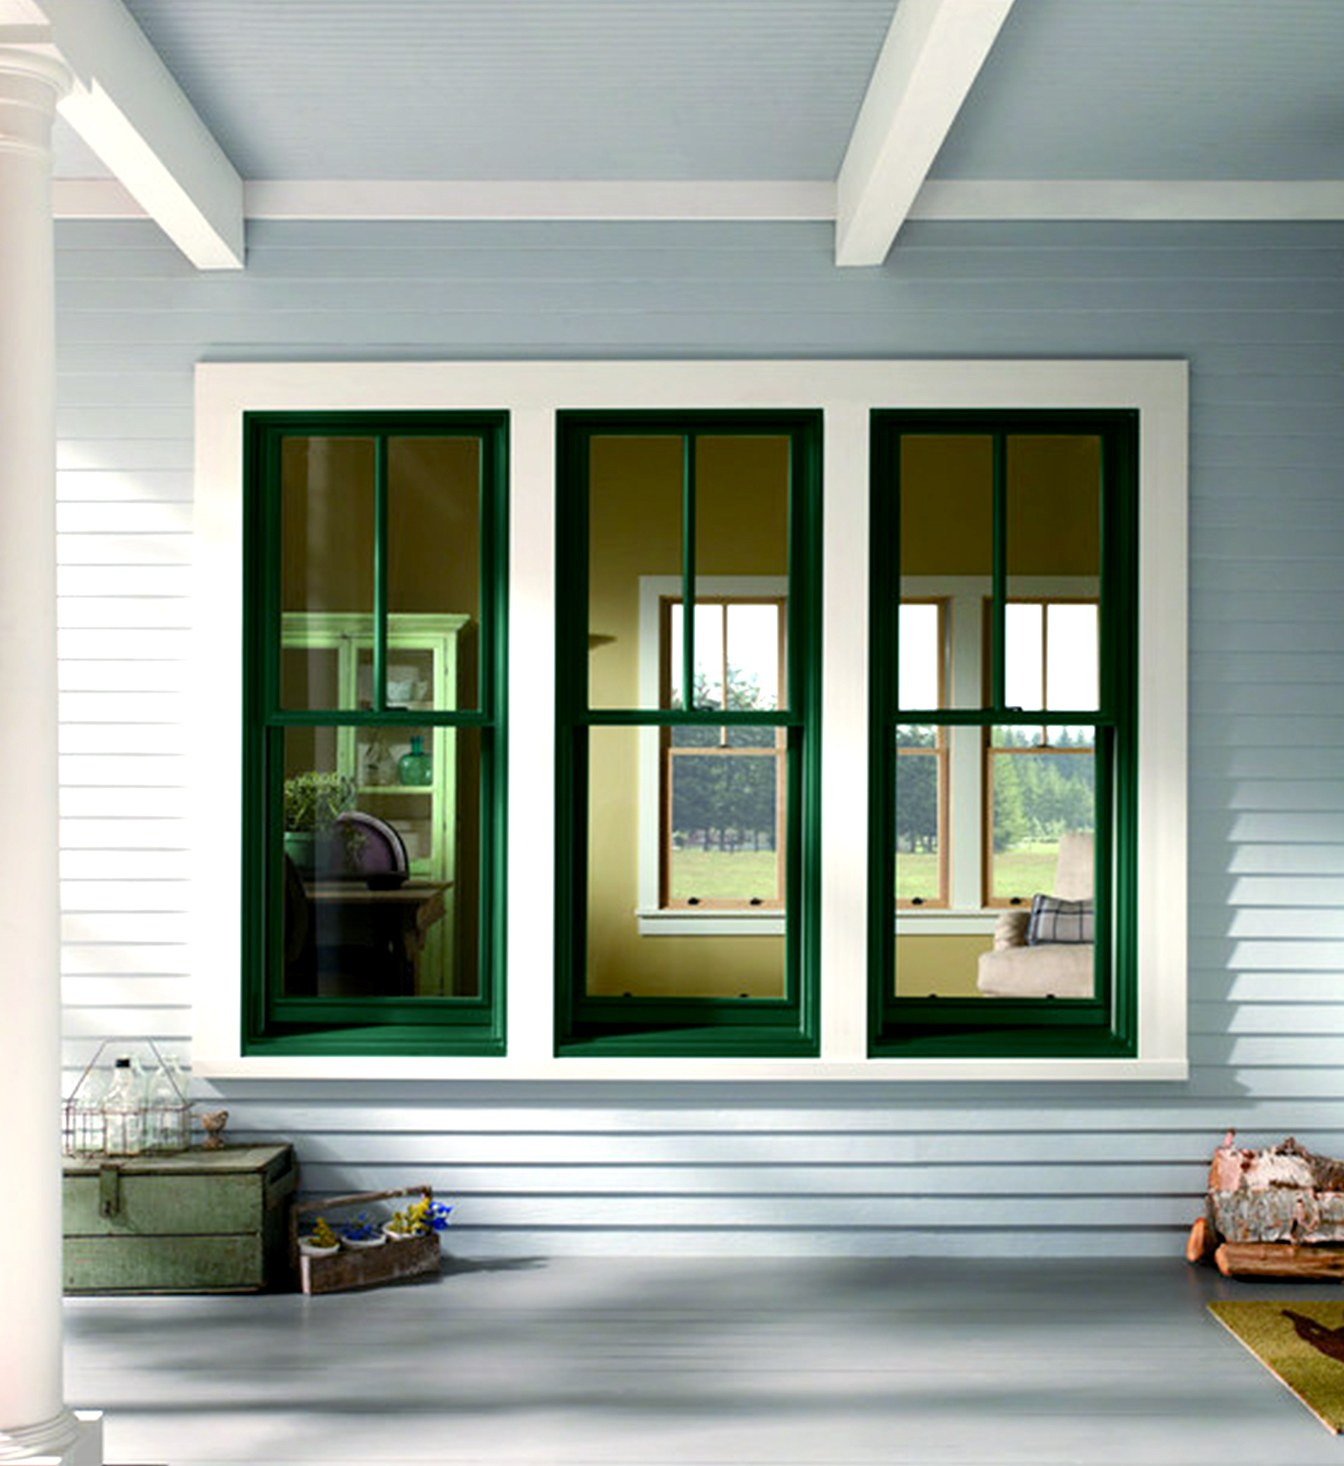 Gallery design center energy efficient windows temple tx for Energy efficient replacement windows